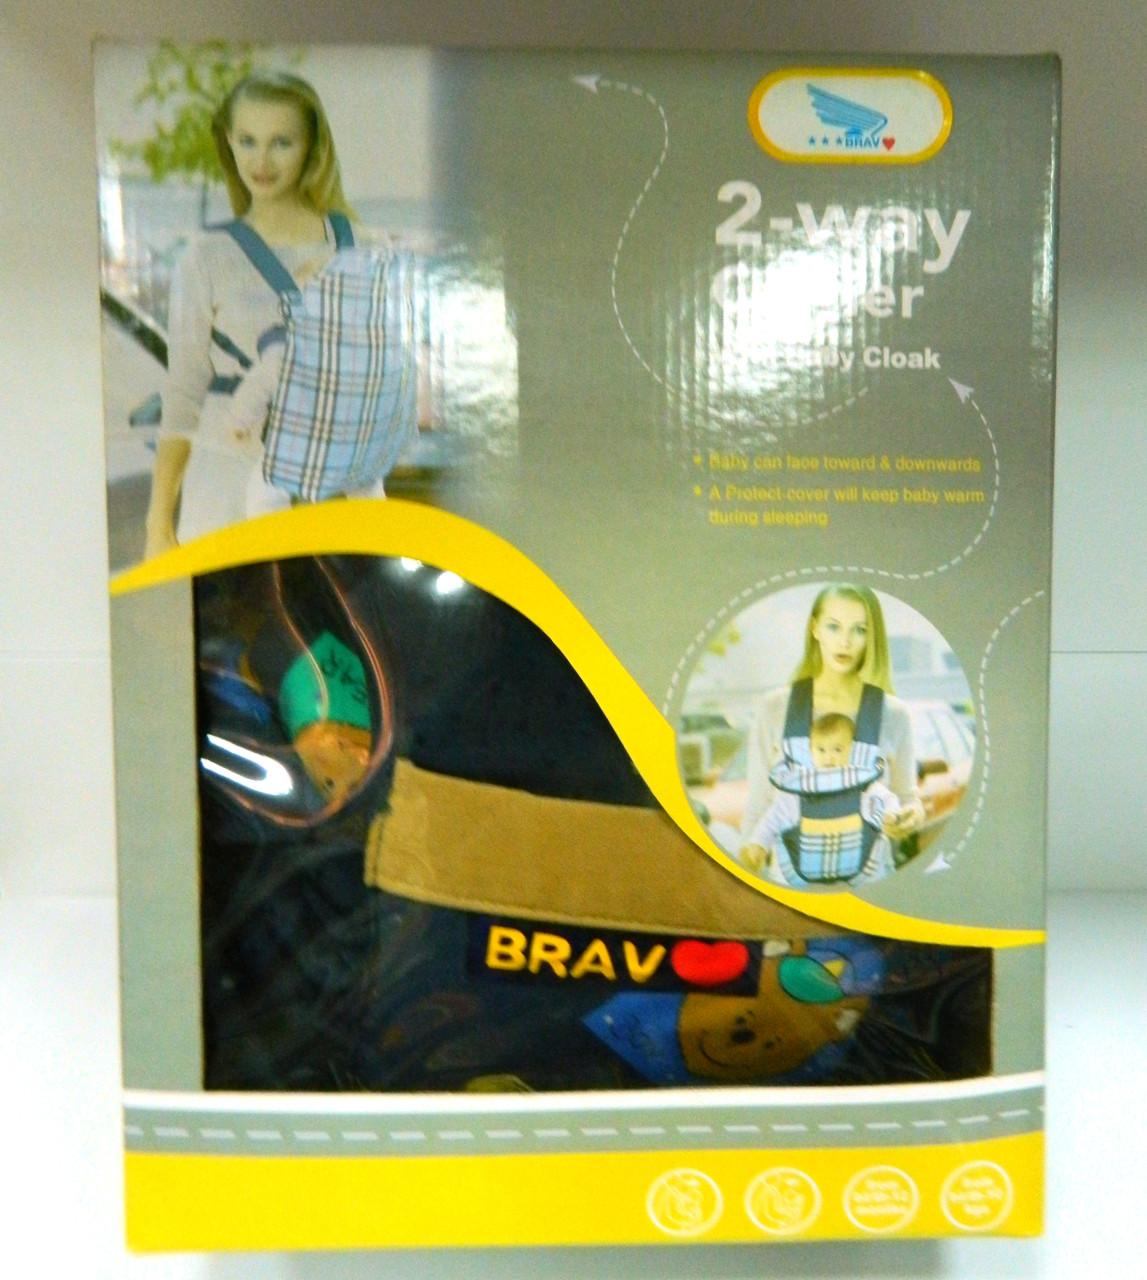 Кенгуру для малыша Bravo (2-way carrier)